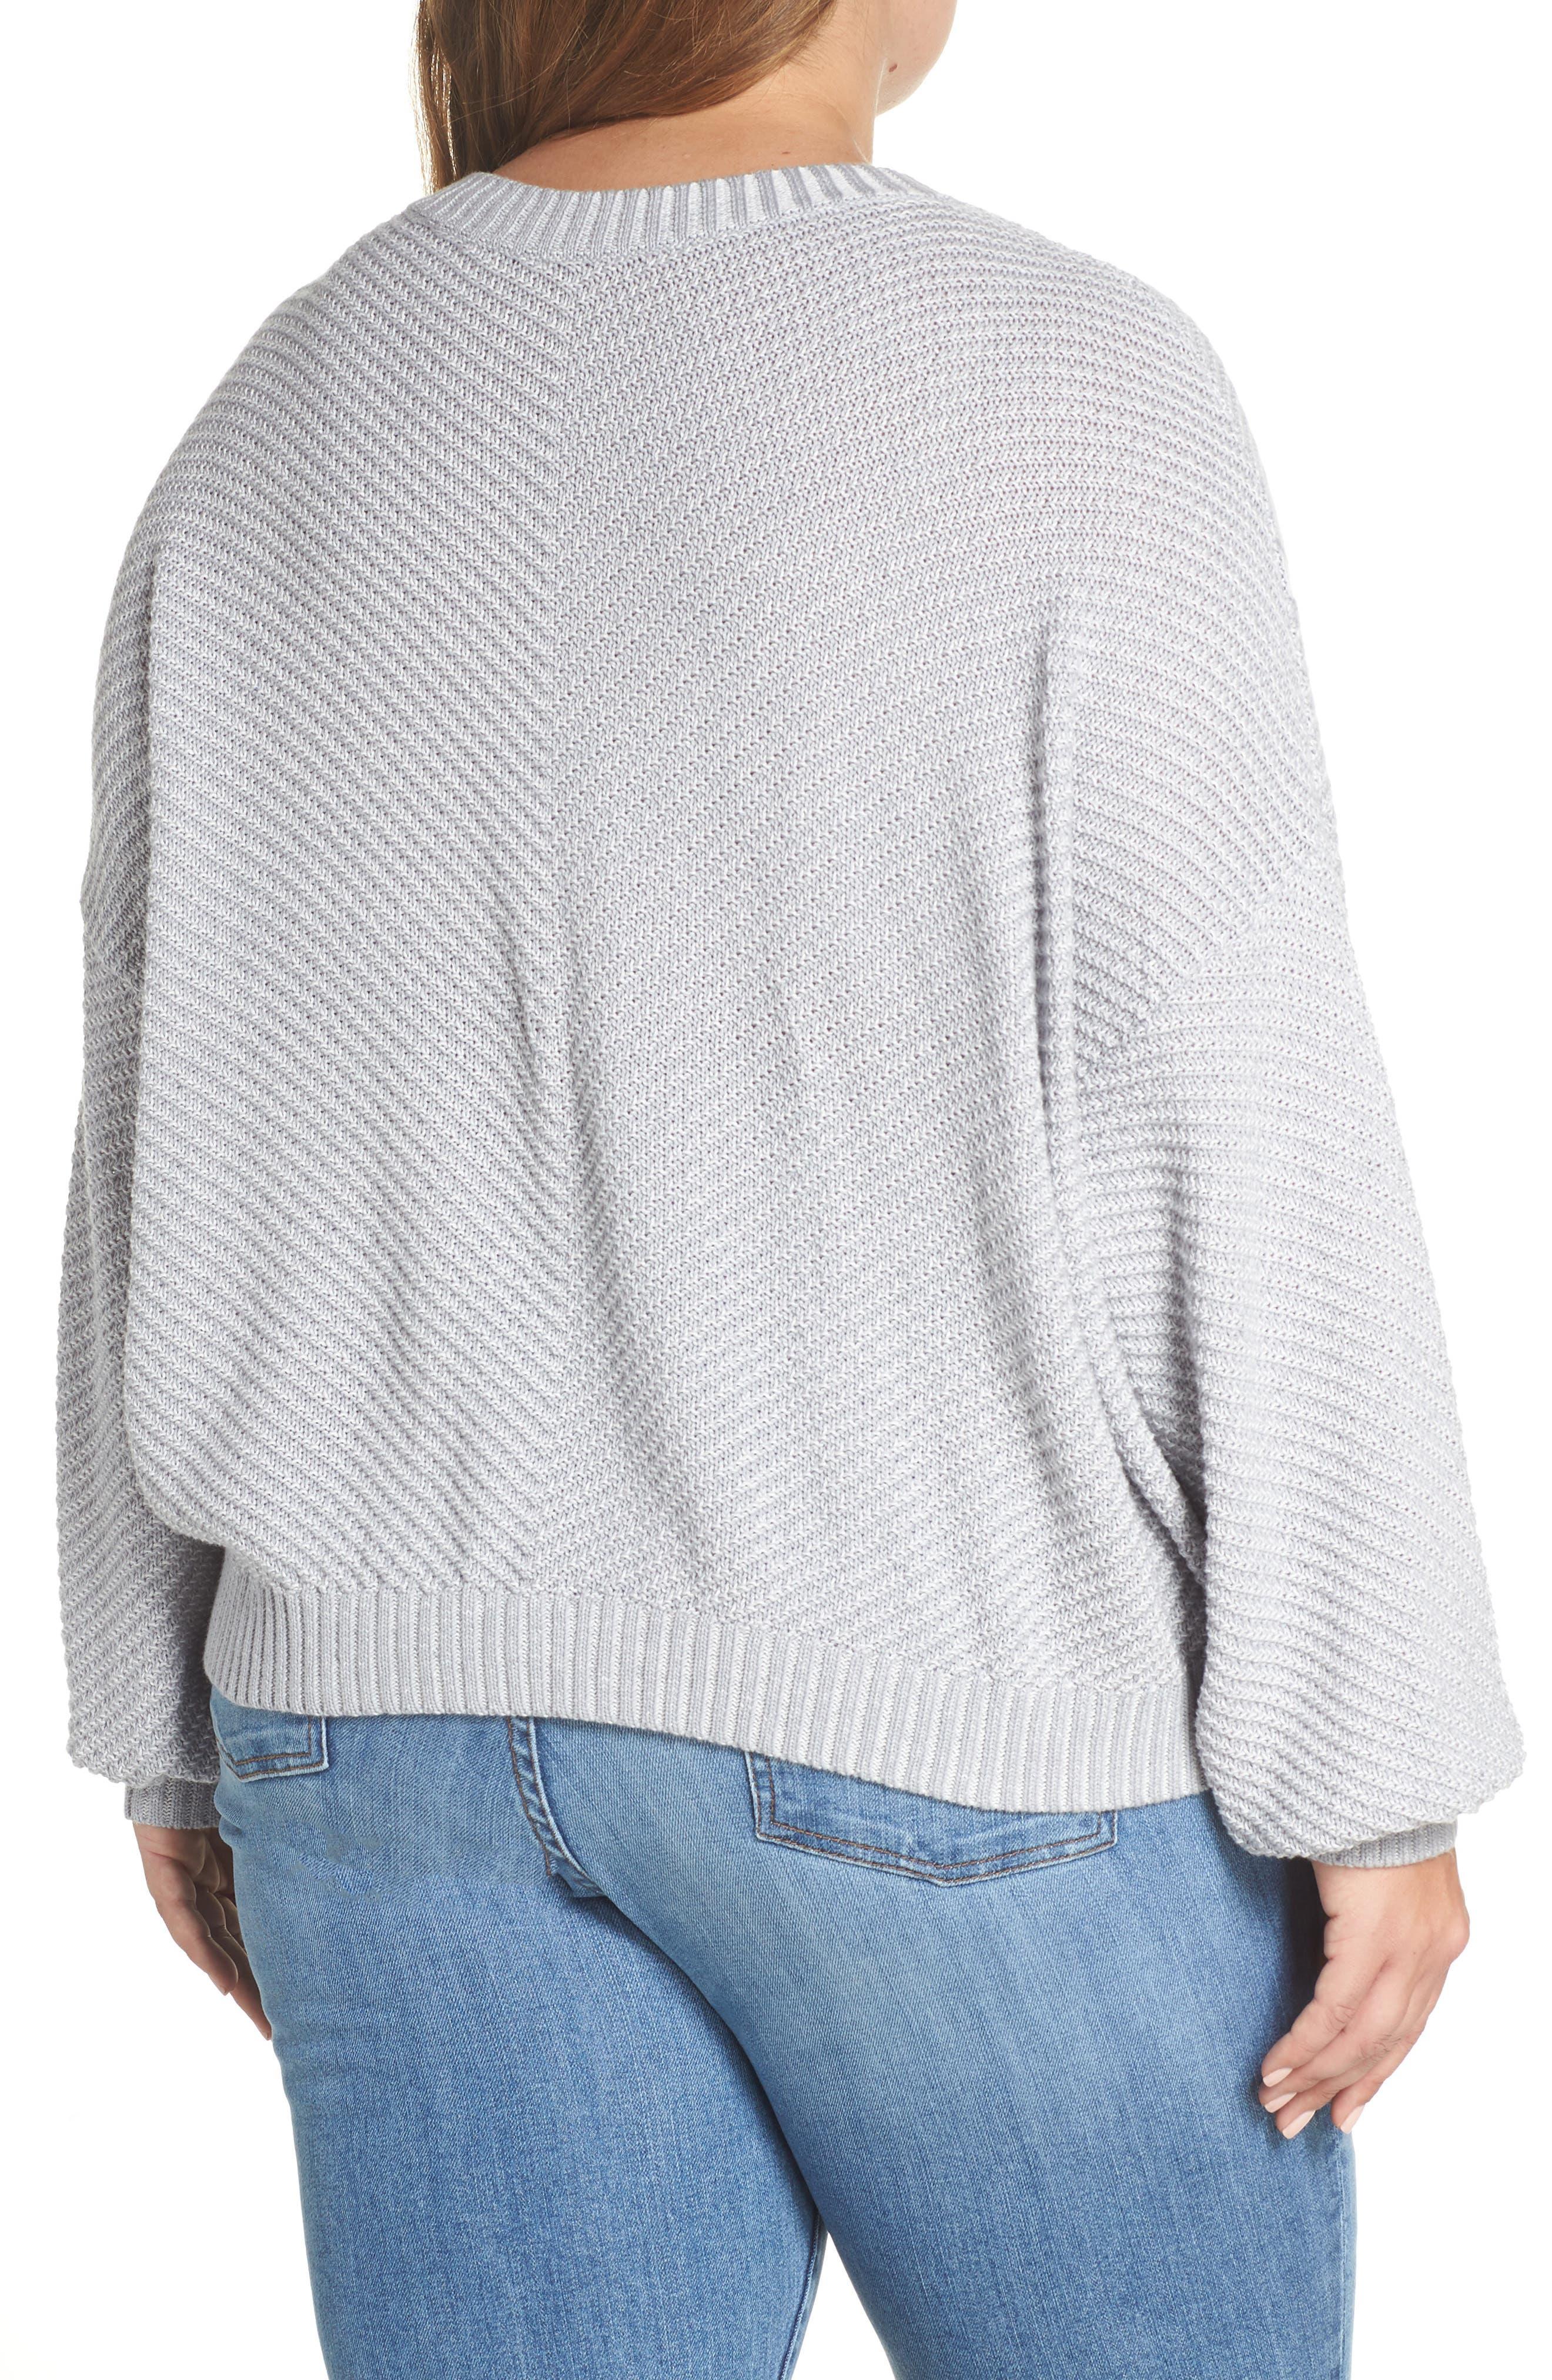 Plaited Drop Shoulder Sweater,                             Alternate thumbnail 8, color,                             050